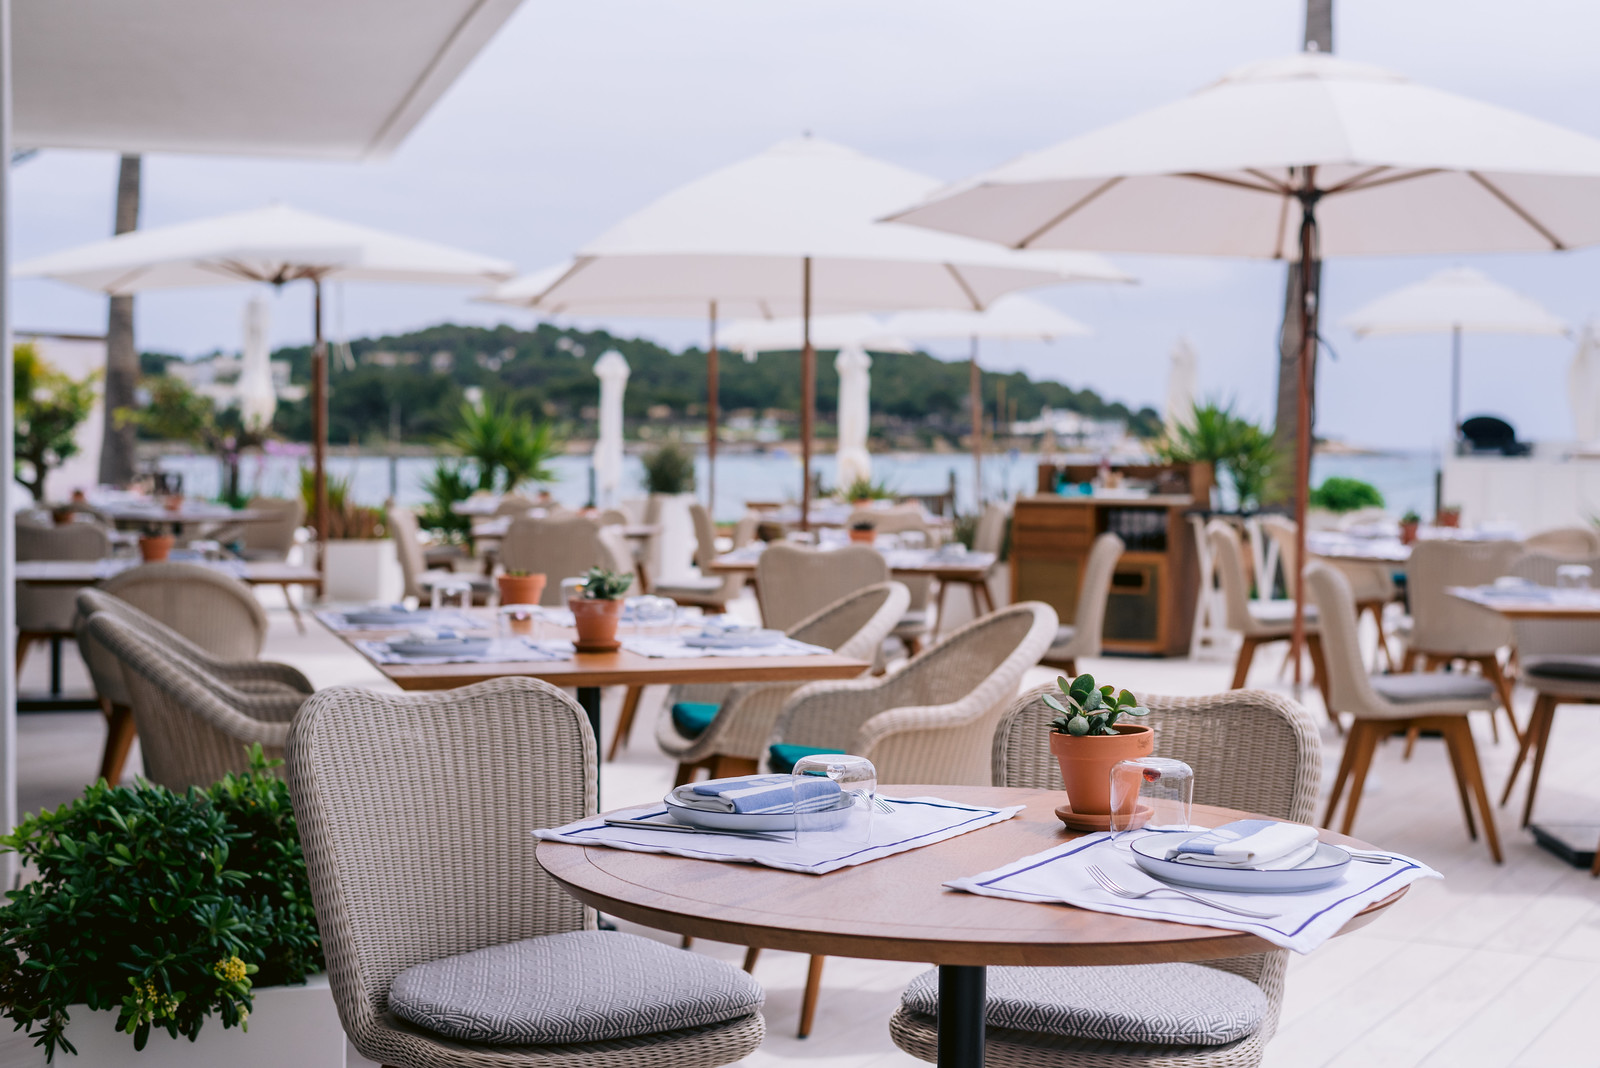 https://www.white-ibiza.com/wp-content/uploads/2021/06/white-ibiza-restaurants-bibo-ibiza-bay-13.jpg